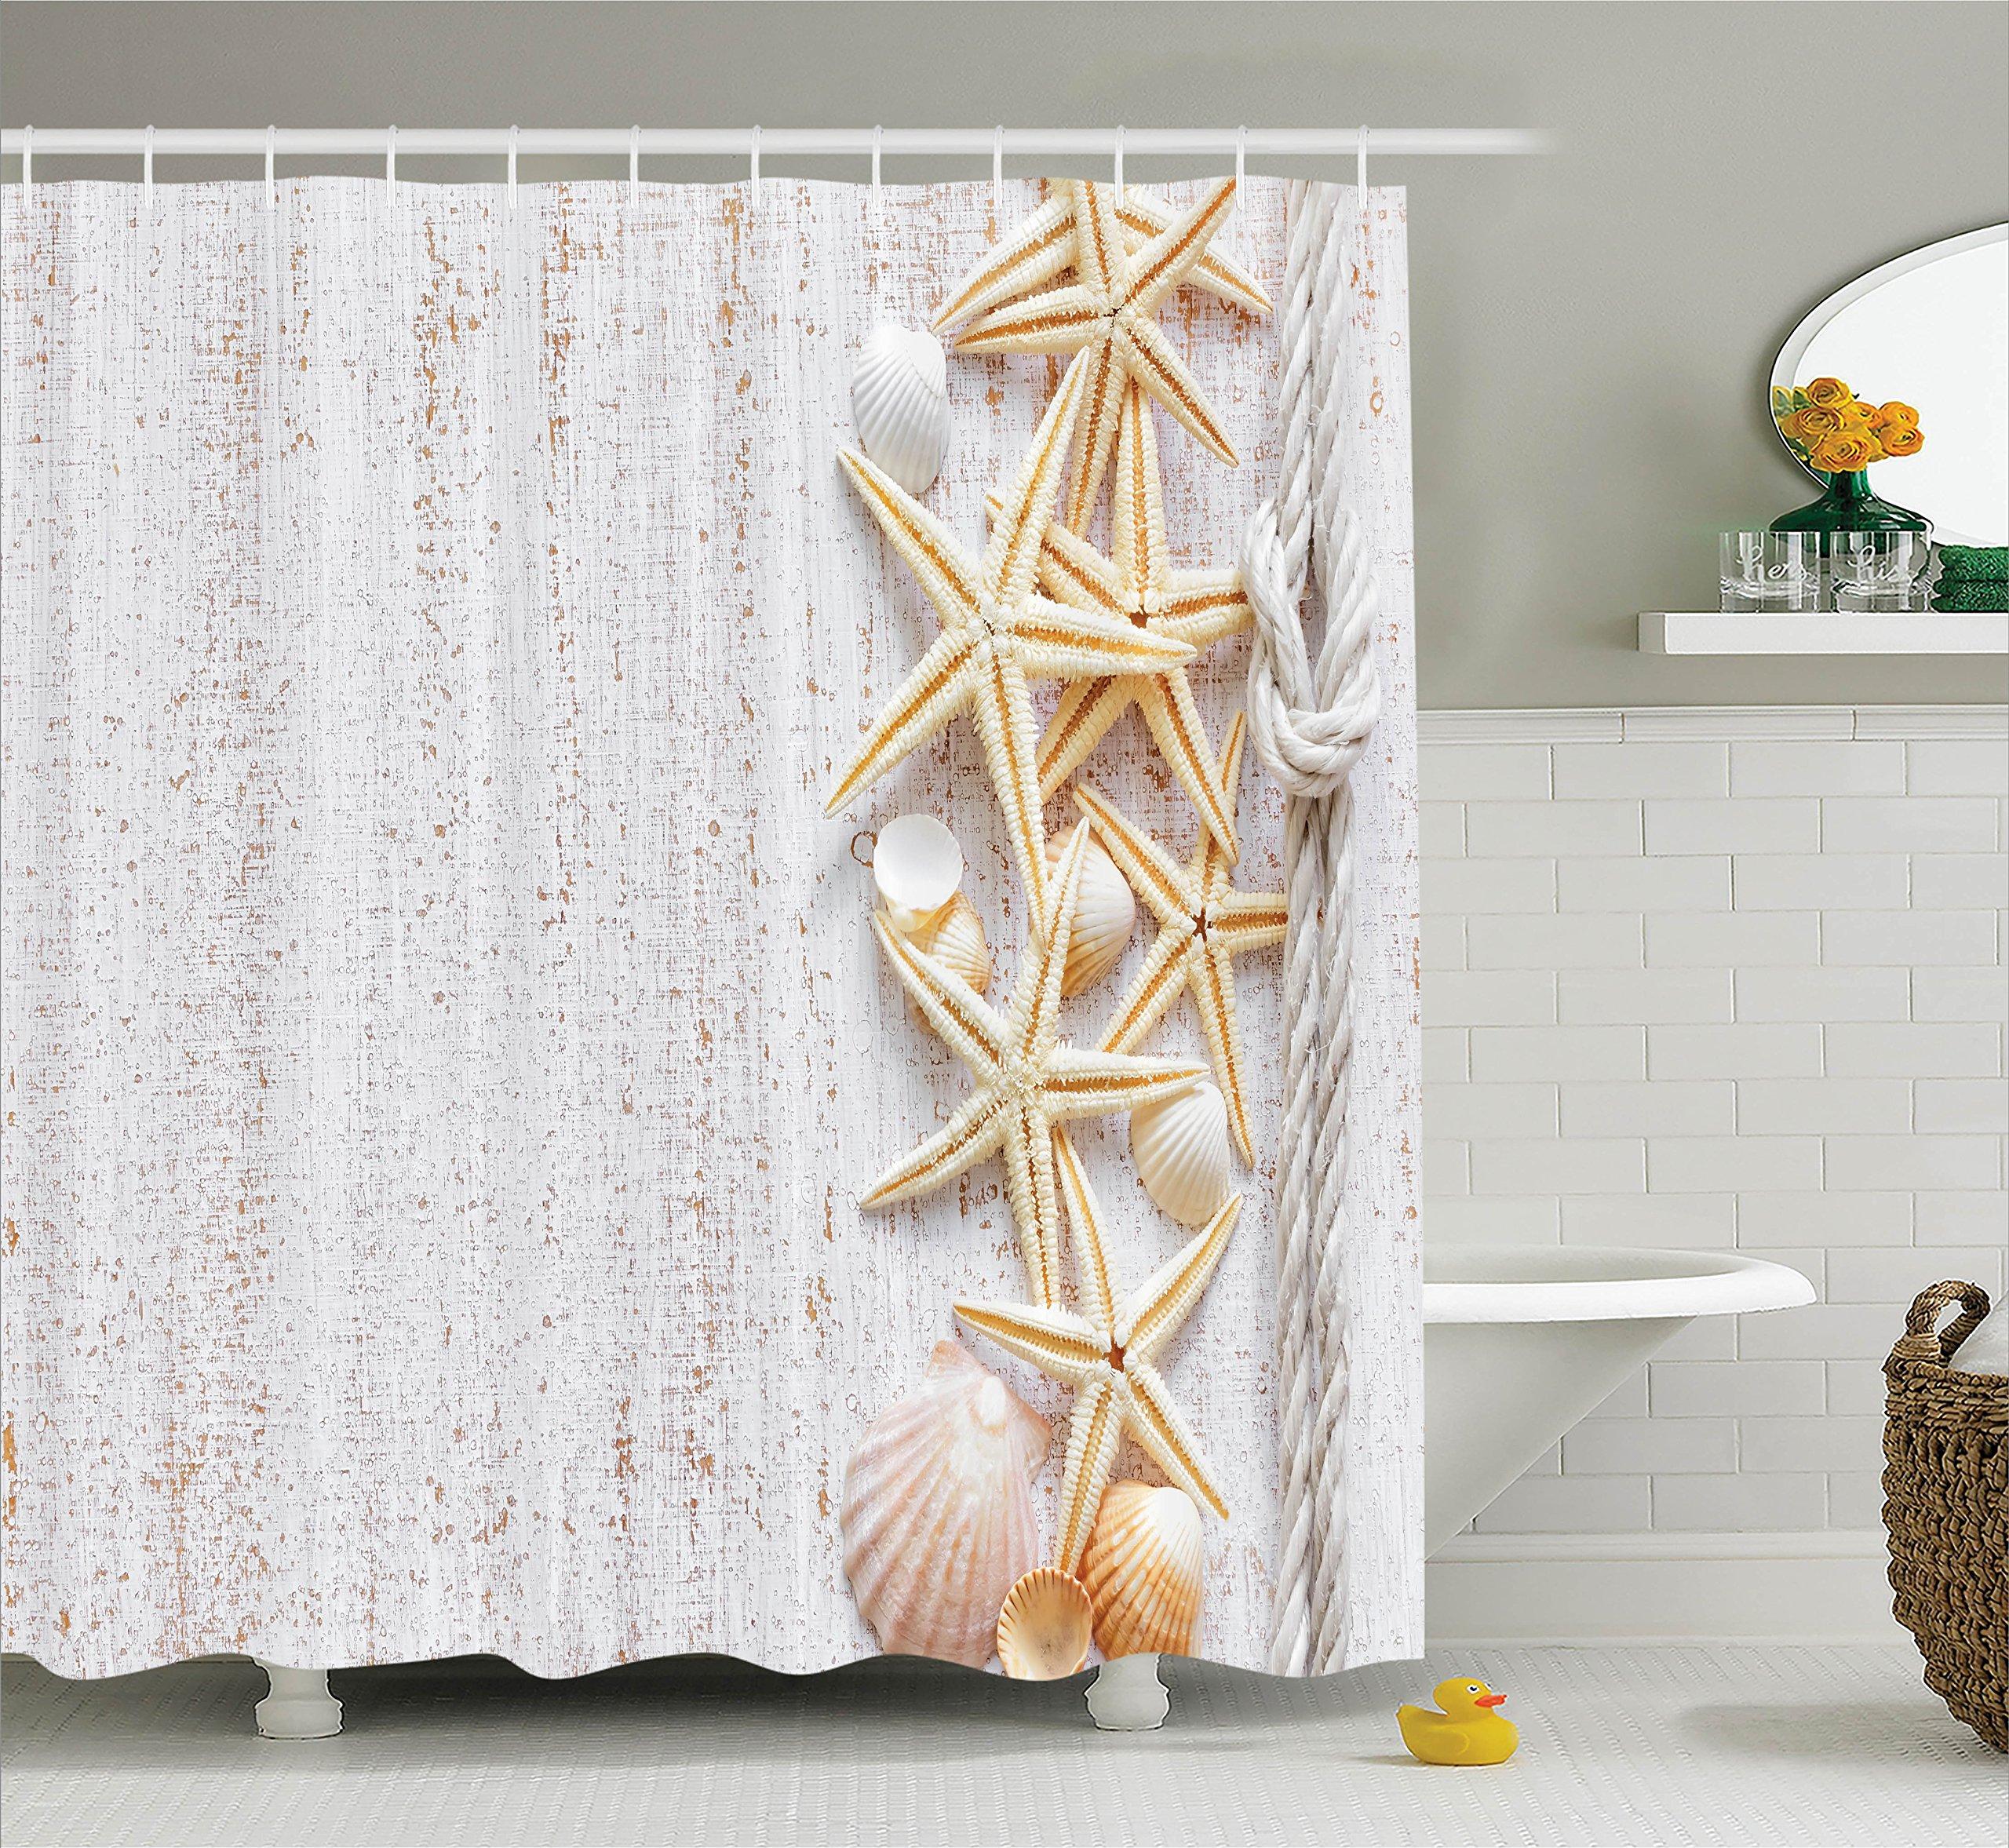 bathroom accessories ideas. Black Bedroom Furniture Sets. Home Design Ideas